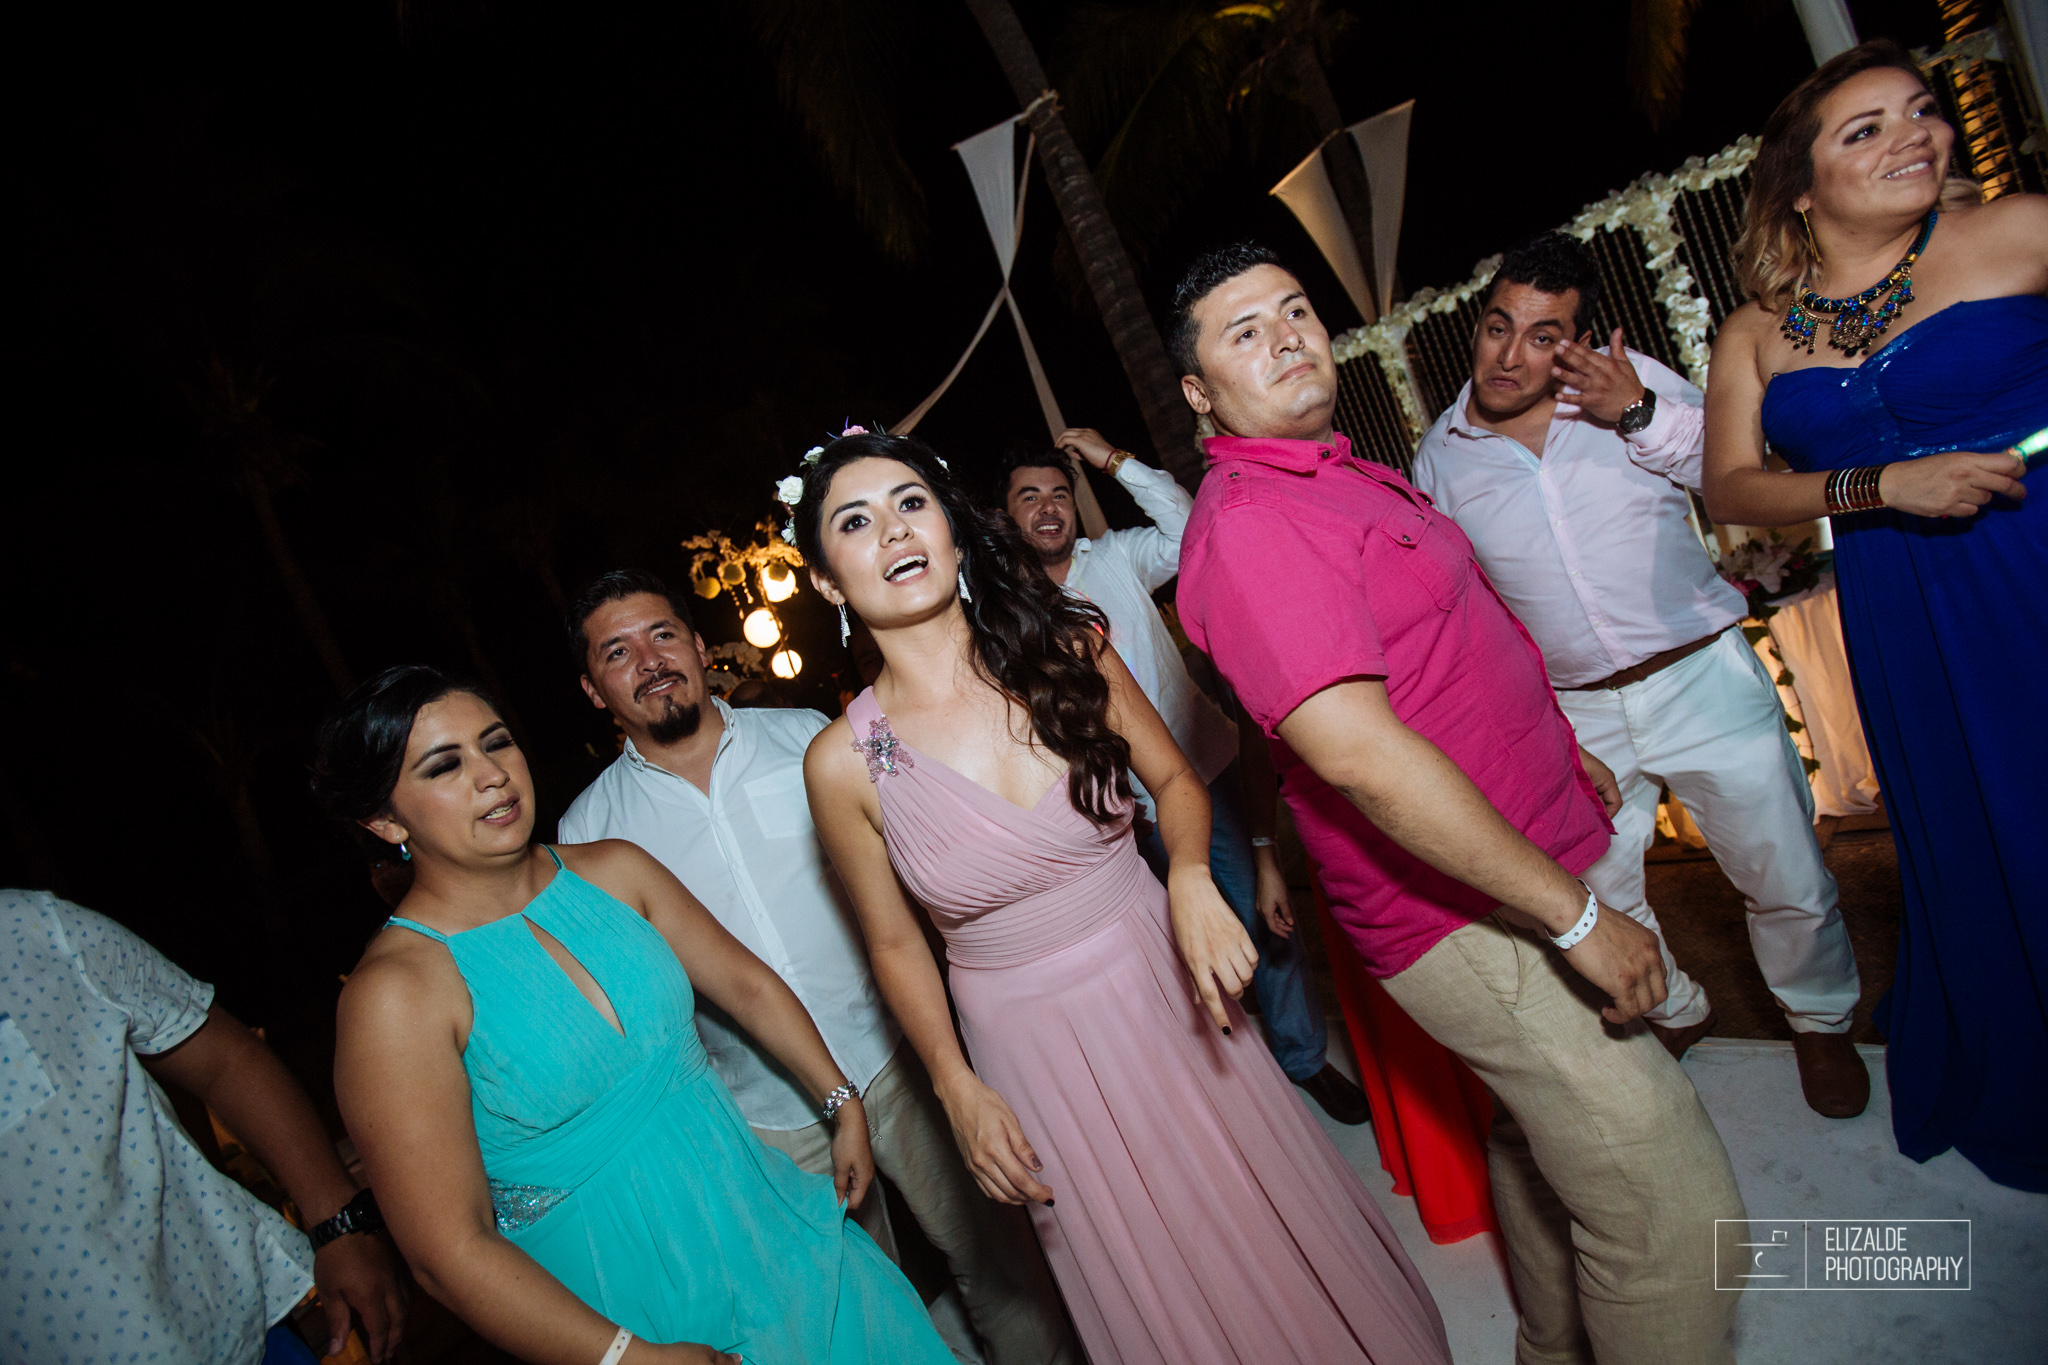 Pay and Ferran_Acapulco_Destination Wedding_Elizalde Photography-122.jpg